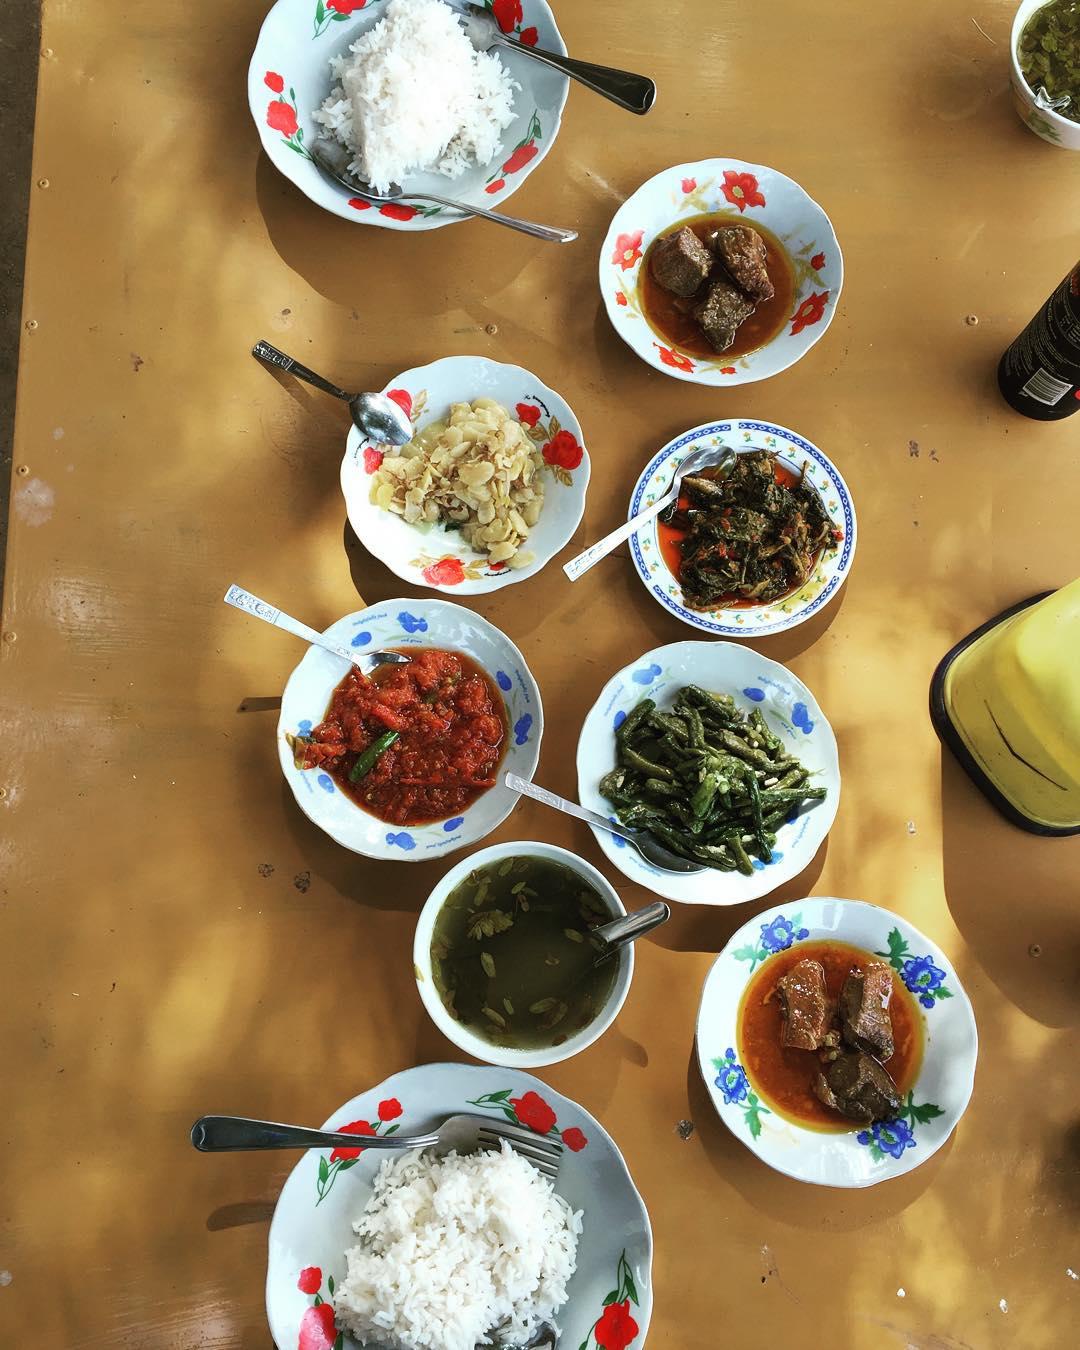 Alimentando el corazon! #benga #trippingmood #myanmar #bagan